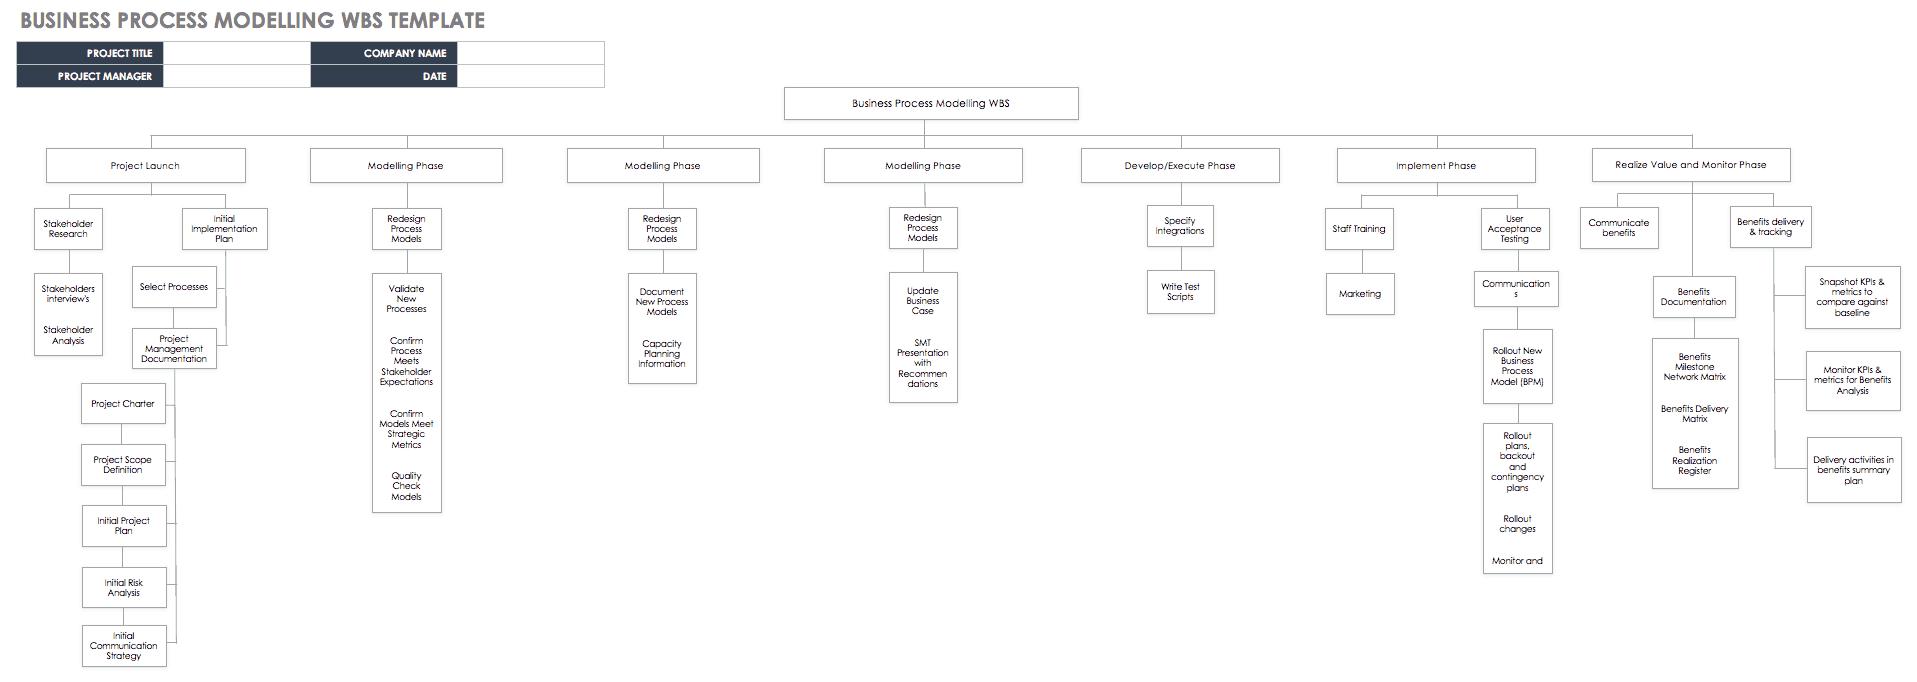 DOCUMENT STRUCTUURPLAN FILETYPE PDF